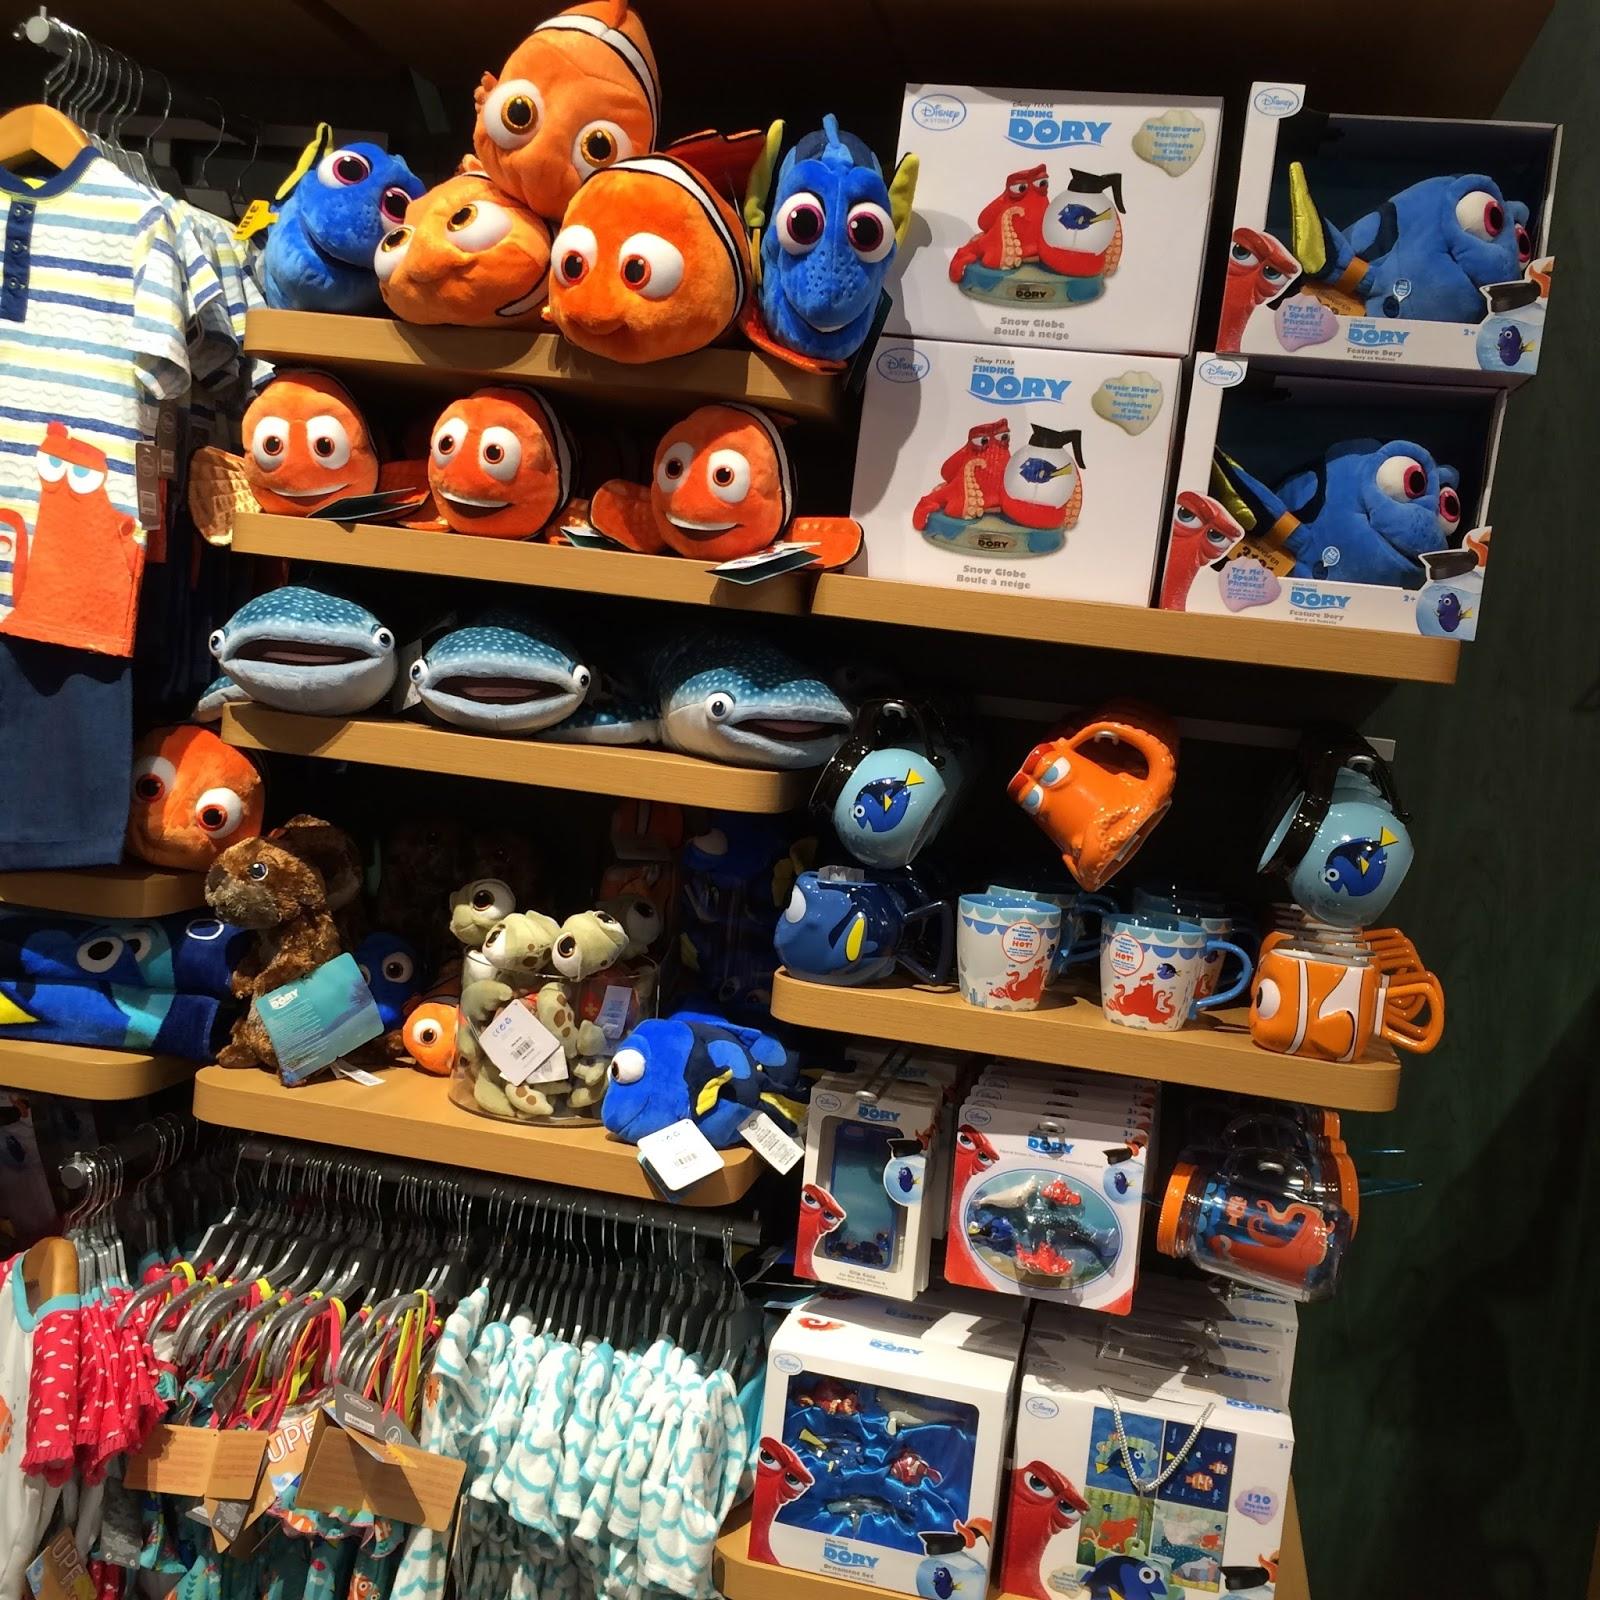 Disney Store Toys : Dan the pixar fan events disney store finding dory merch